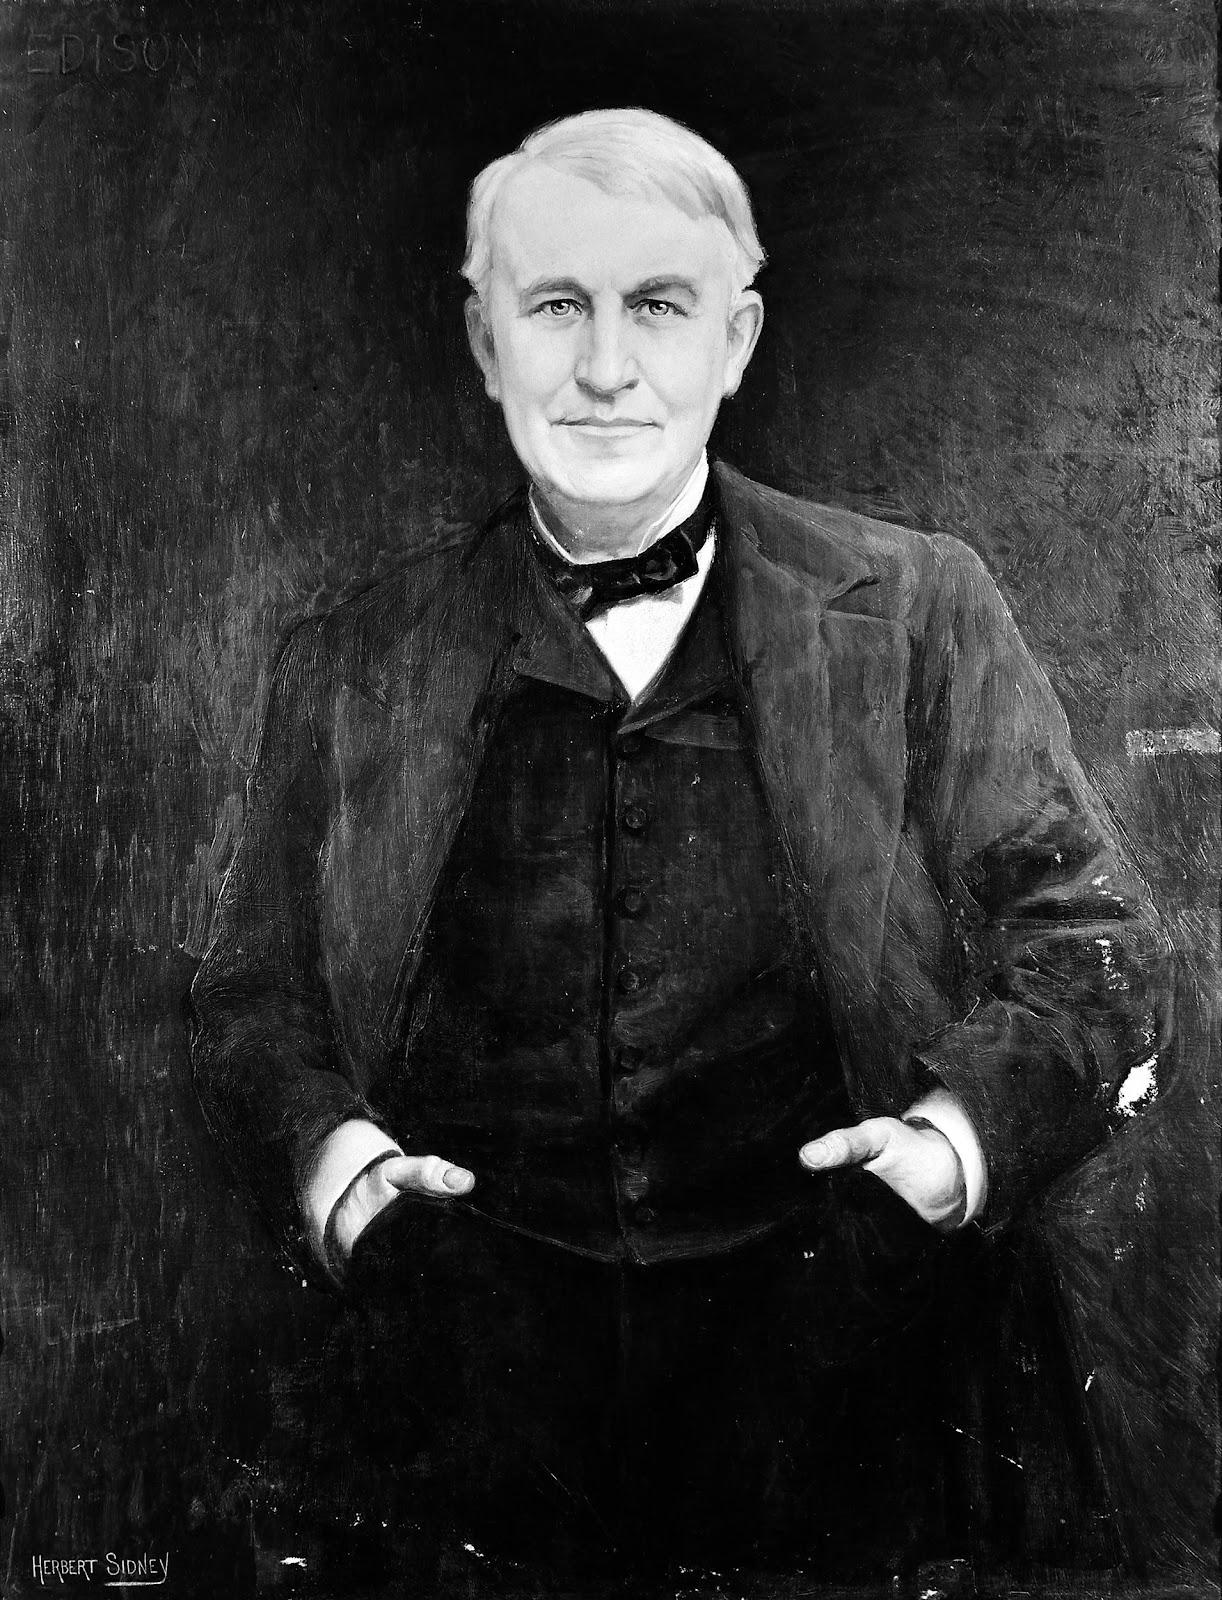 File:Portrait of Thomas Edison Wellcome M0006711.jpg - Wikimedia Commons